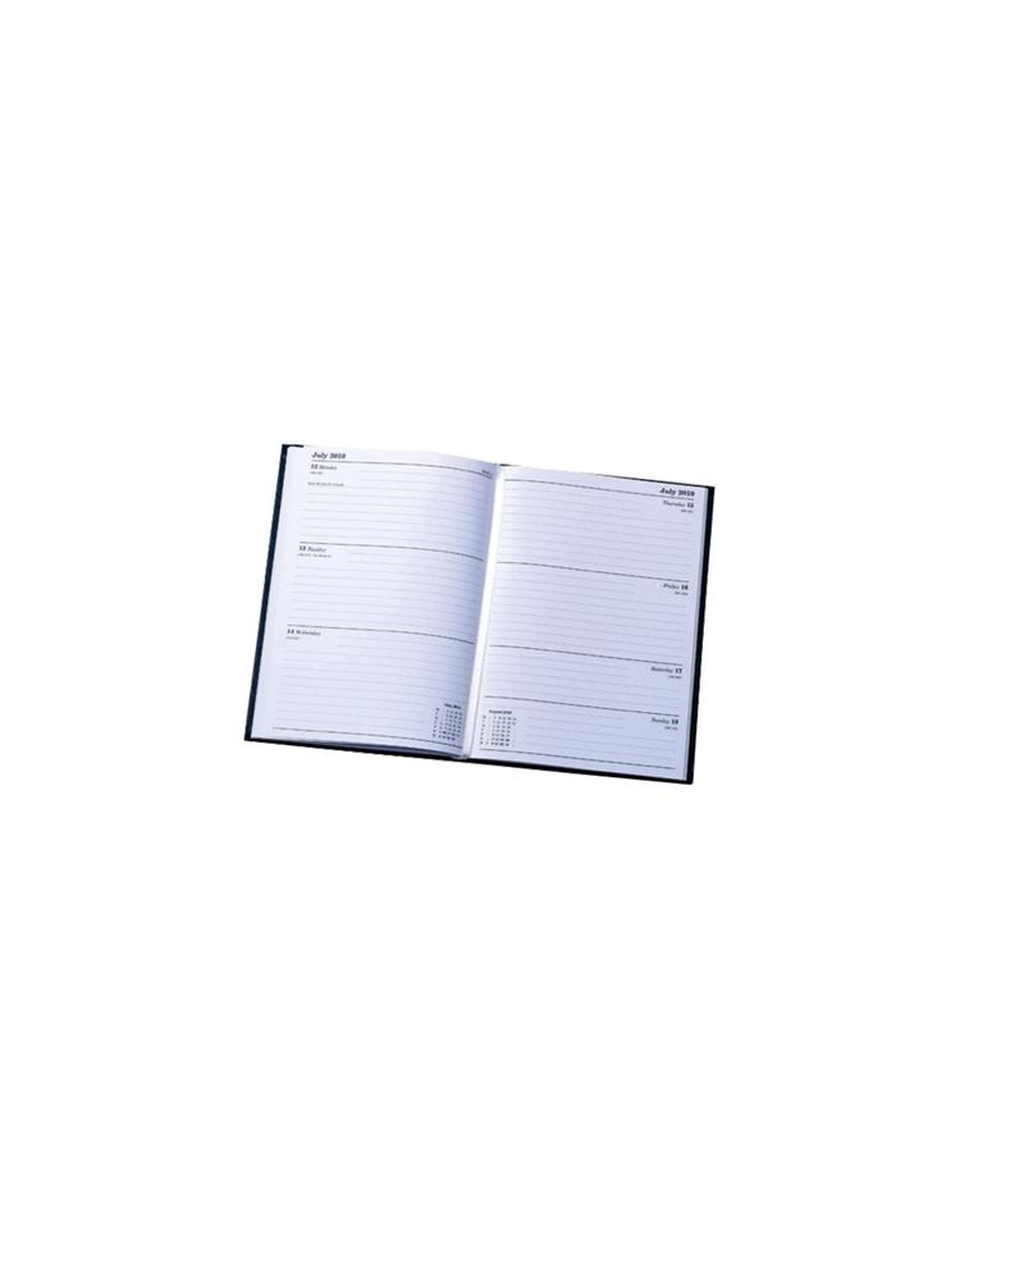 A4 Calendar Year Diary - Week to View 2020